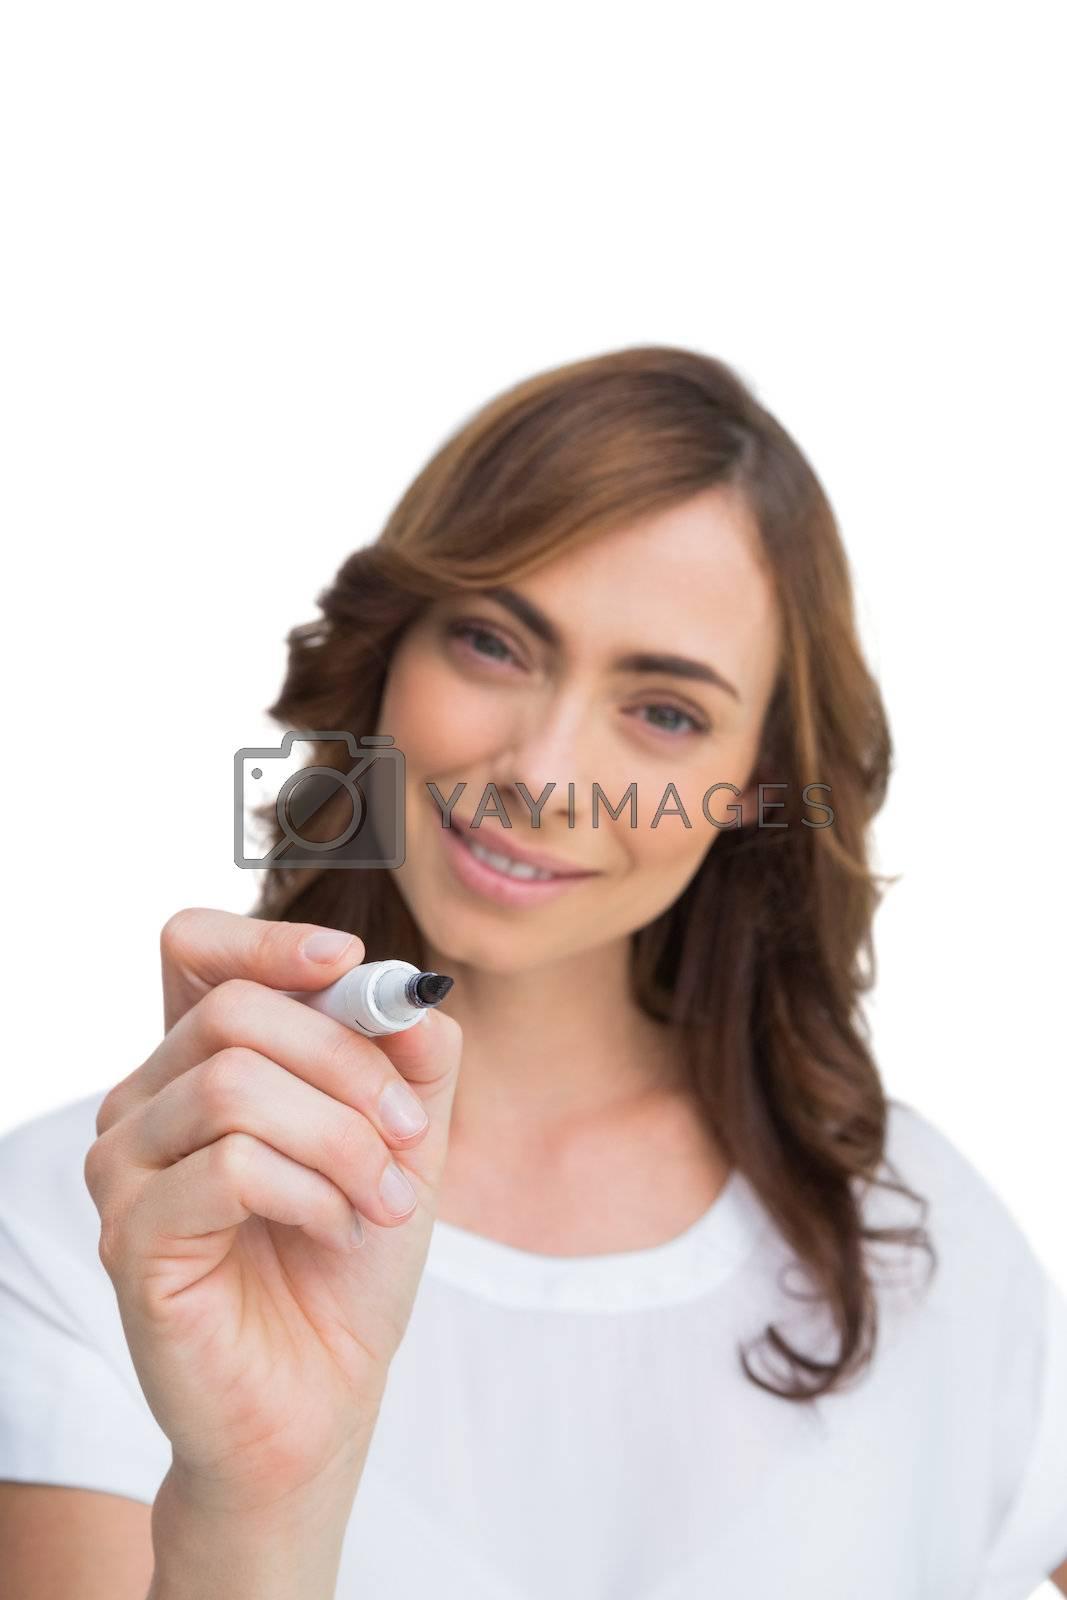 Smiling businesswoman holding whiteboard marker by Wavebreakmedia